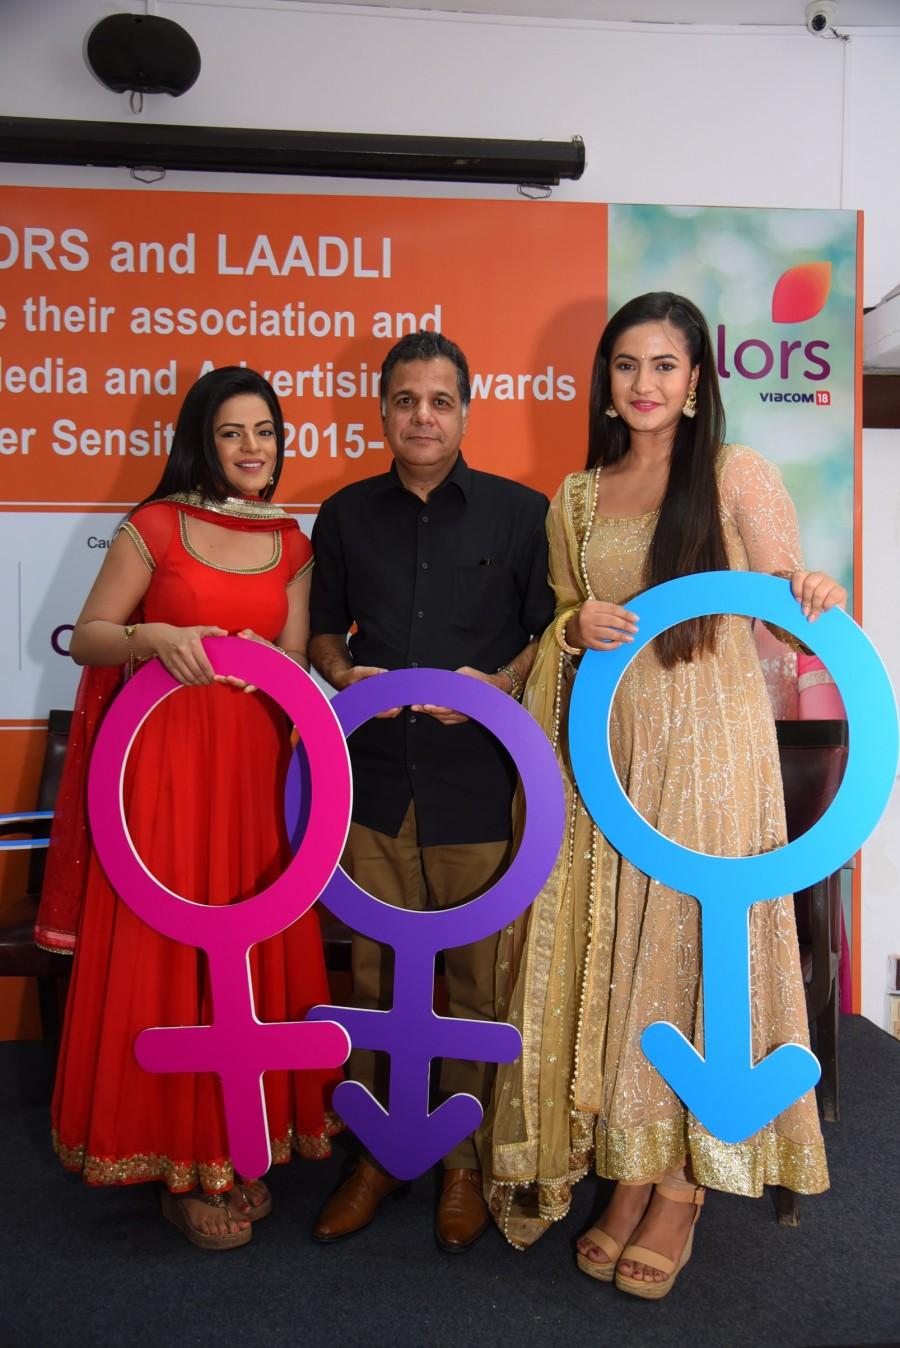 Laadli,Laadli Media,Gender Sensitivity,COLORS,Advertising Awards,Jigyasa Singh,Meera Deosthale